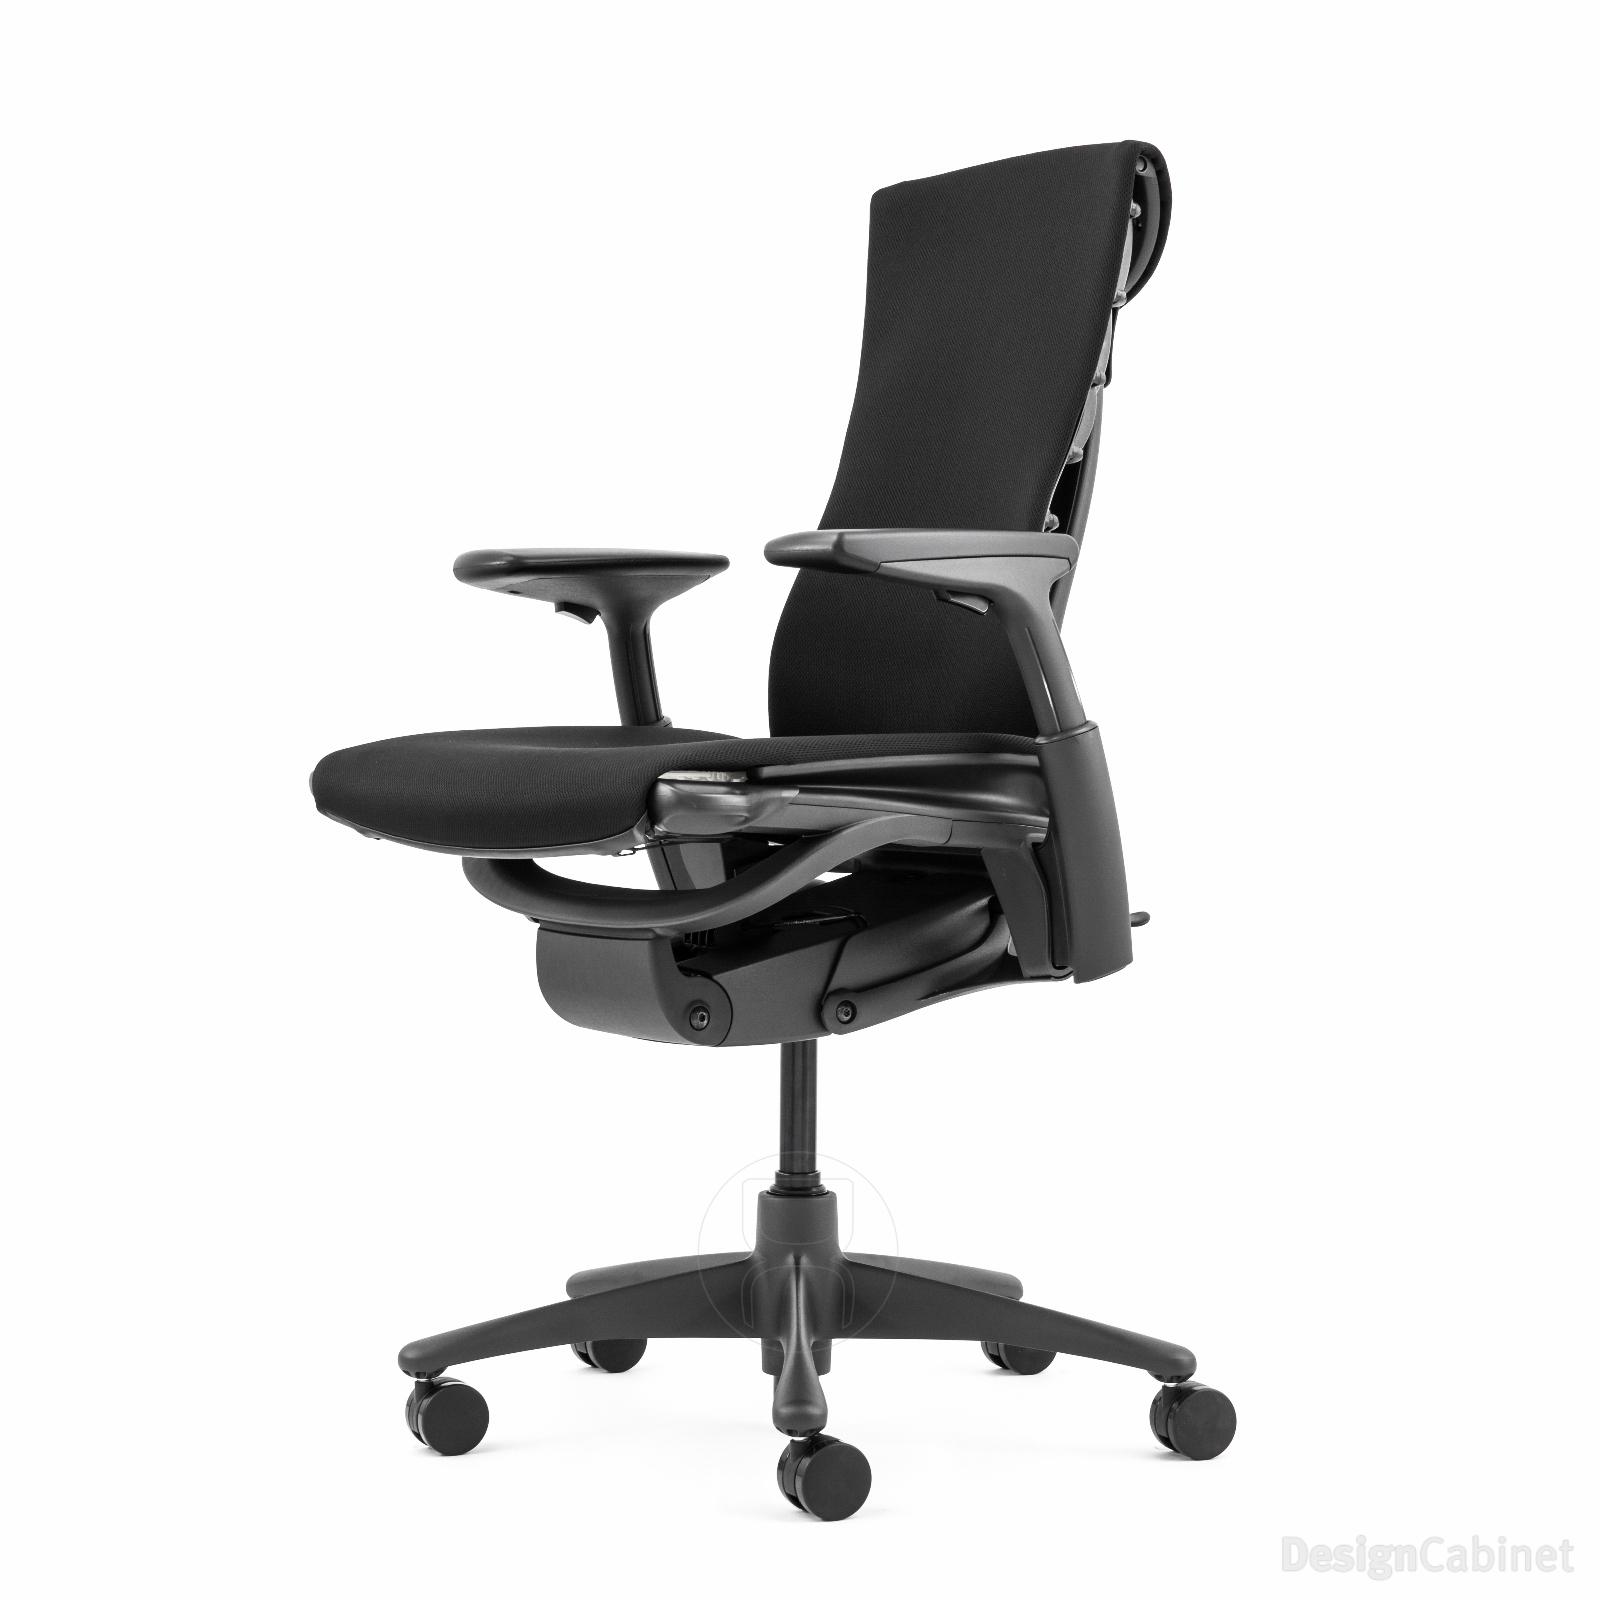 herman miller embody herman miller swivel chairs designcabinet official herman miller. Black Bedroom Furniture Sets. Home Design Ideas